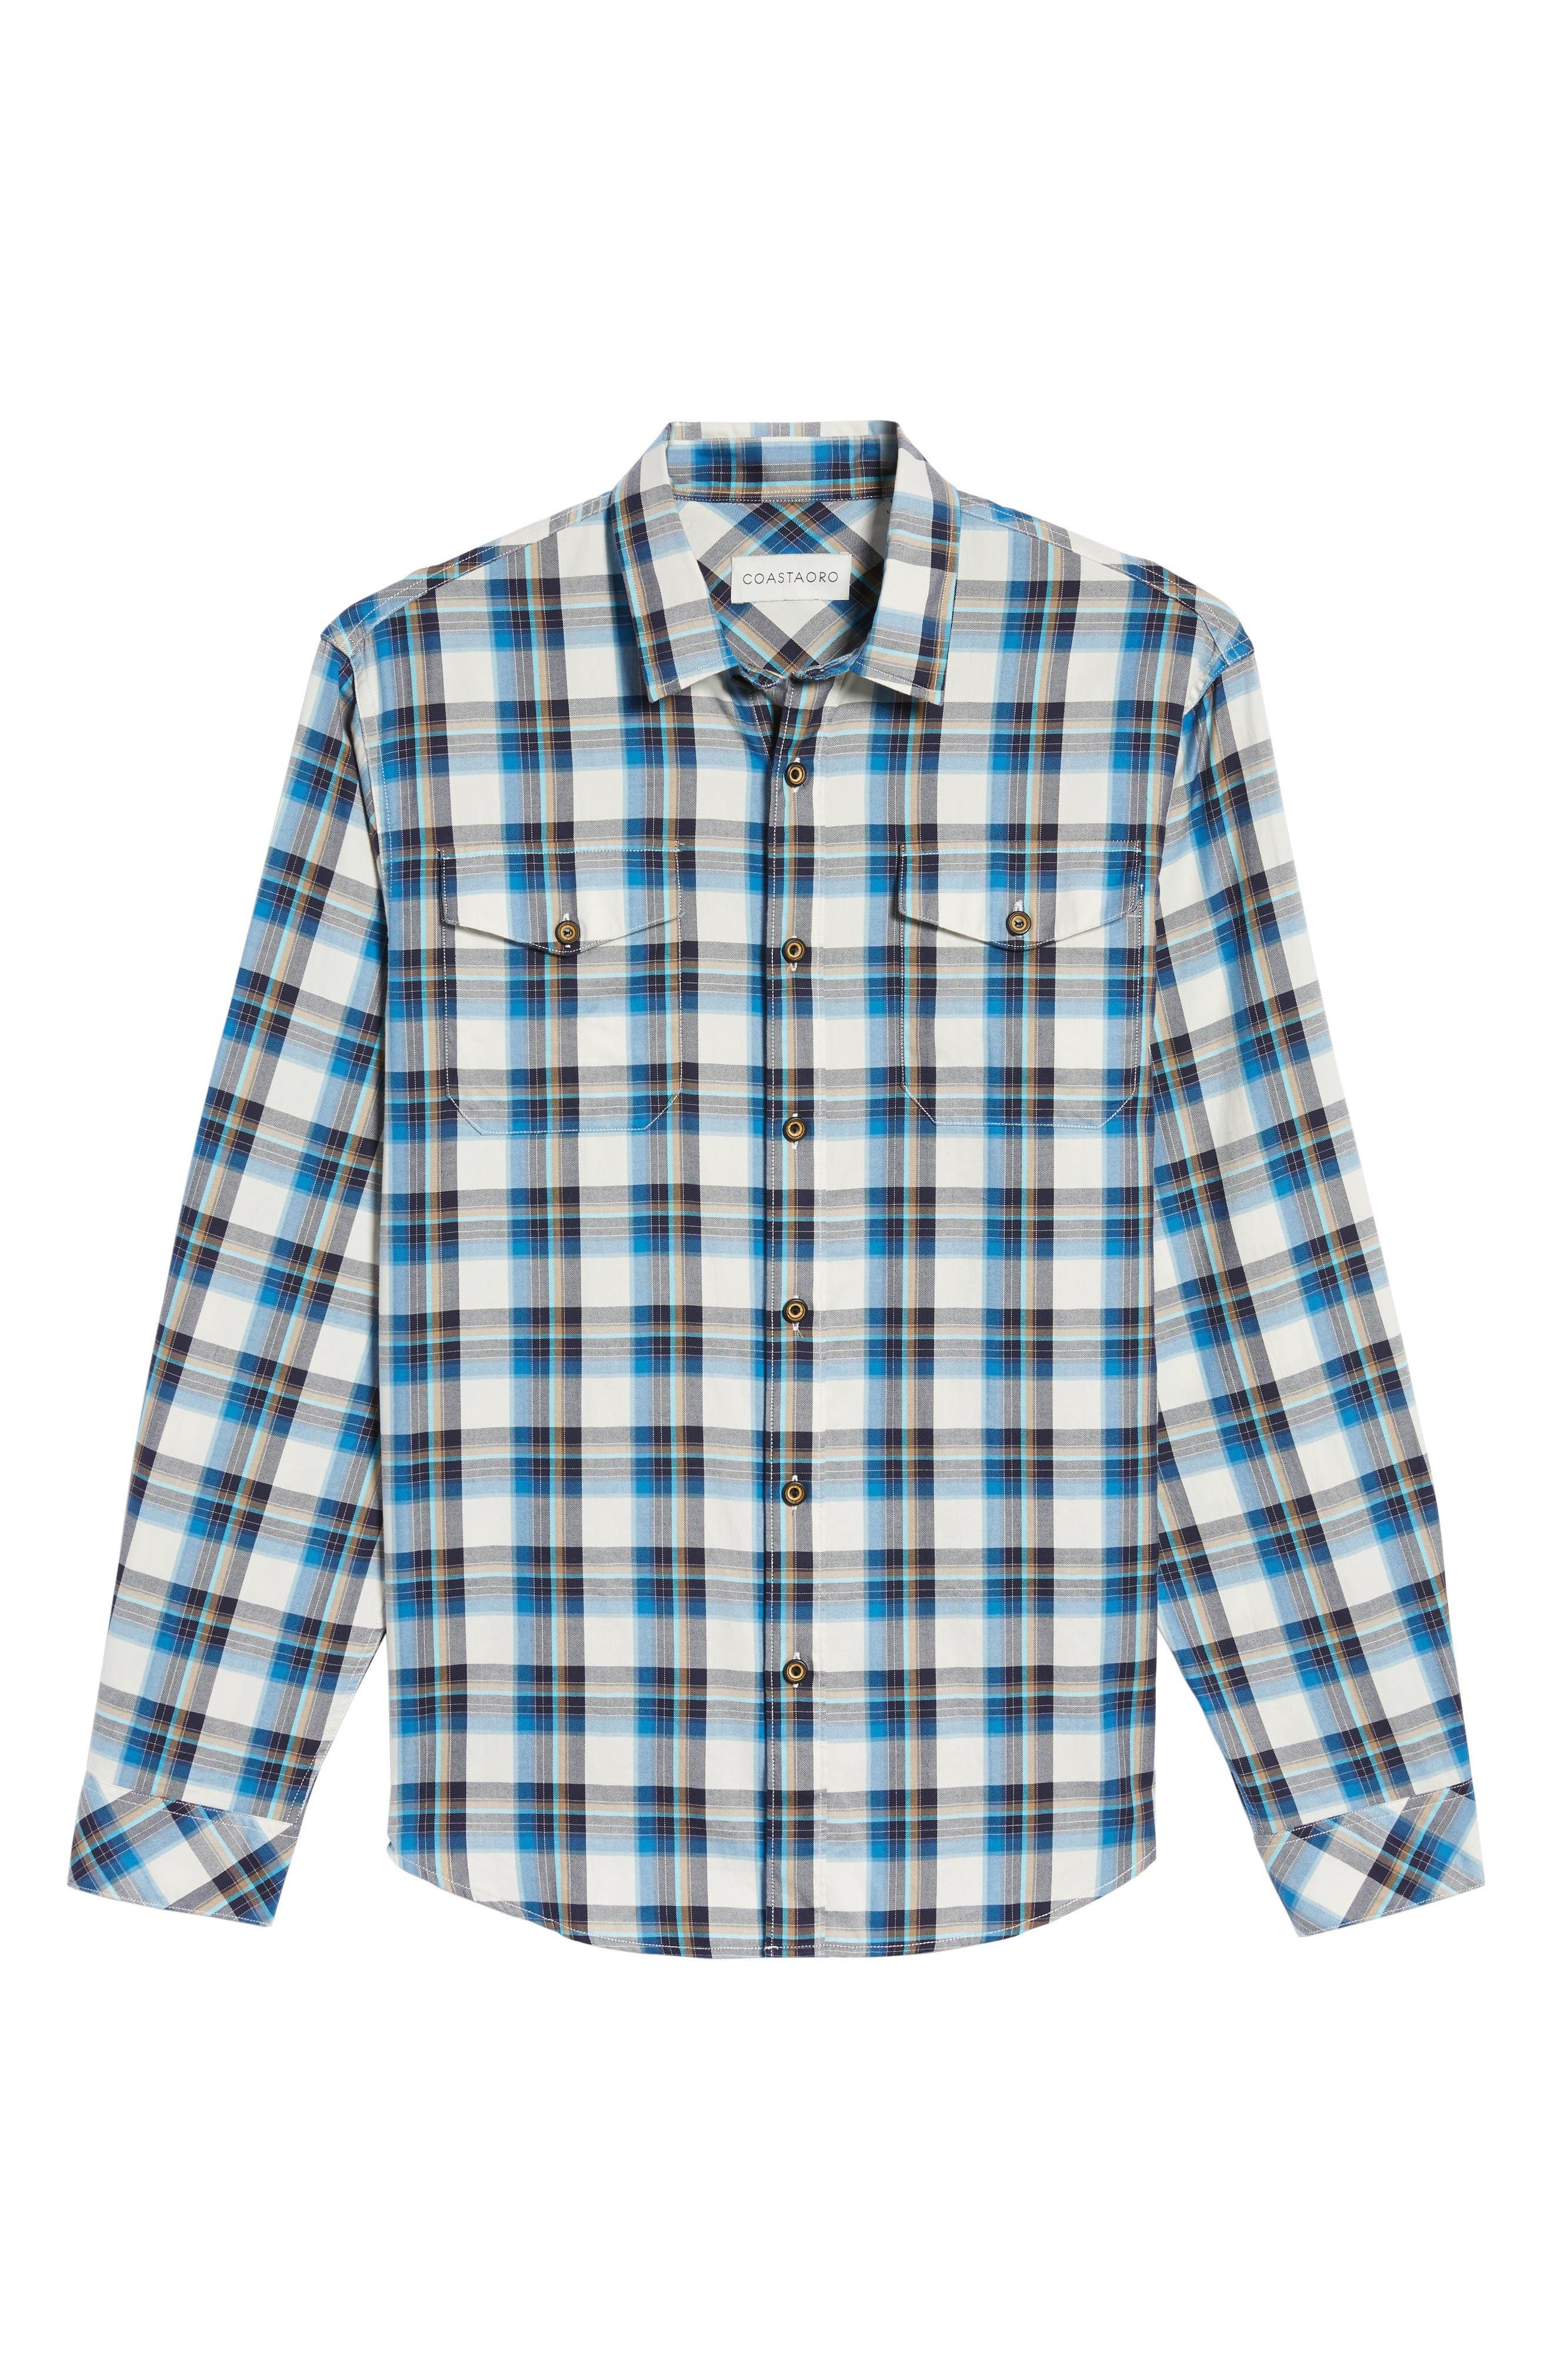 Seacliff Plaid Flannel Shirt,                             Alternate thumbnail 6, color,                             439